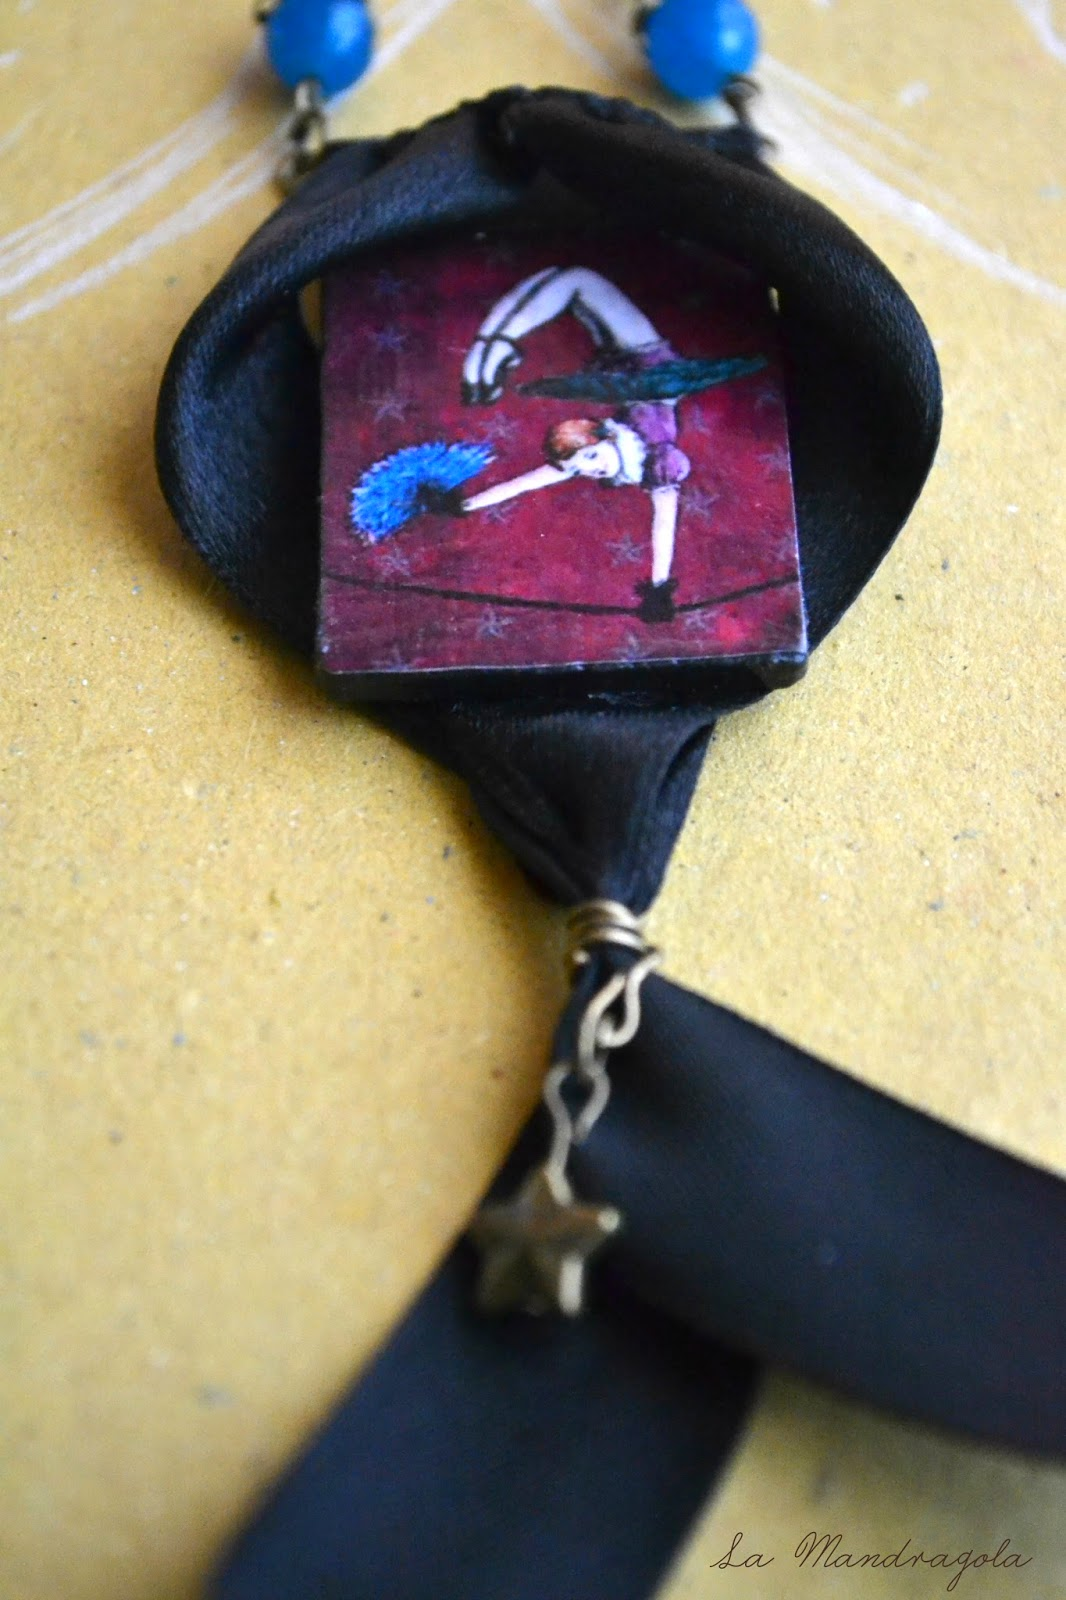 Night Circus - acrobat - freak show - violet - necklace - la mandragola - Flavia Luglioli - illustration - victorian - etsy - circus - carnival - carousel